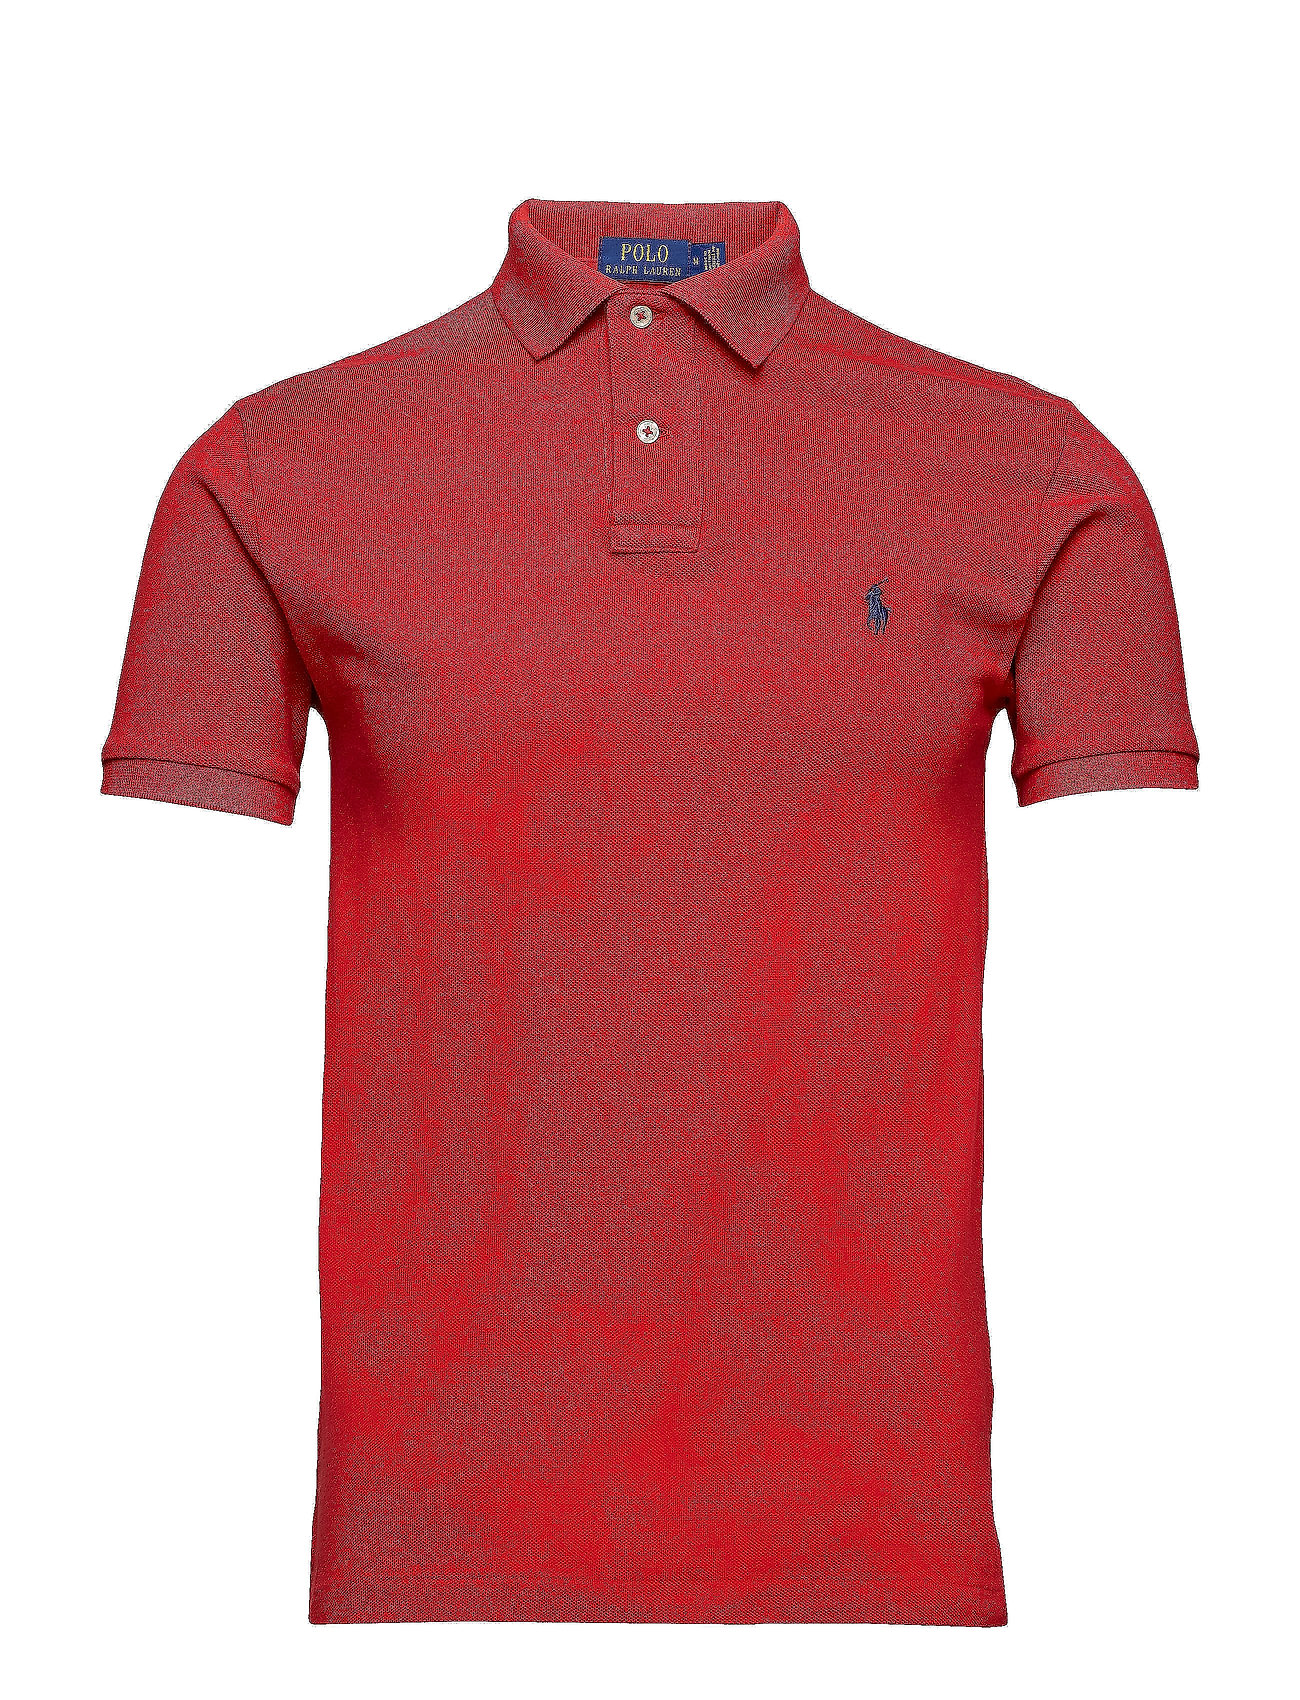 Polo Ralph Lauren Slim Fit Mesh Polo Shirt - RL2000 RED